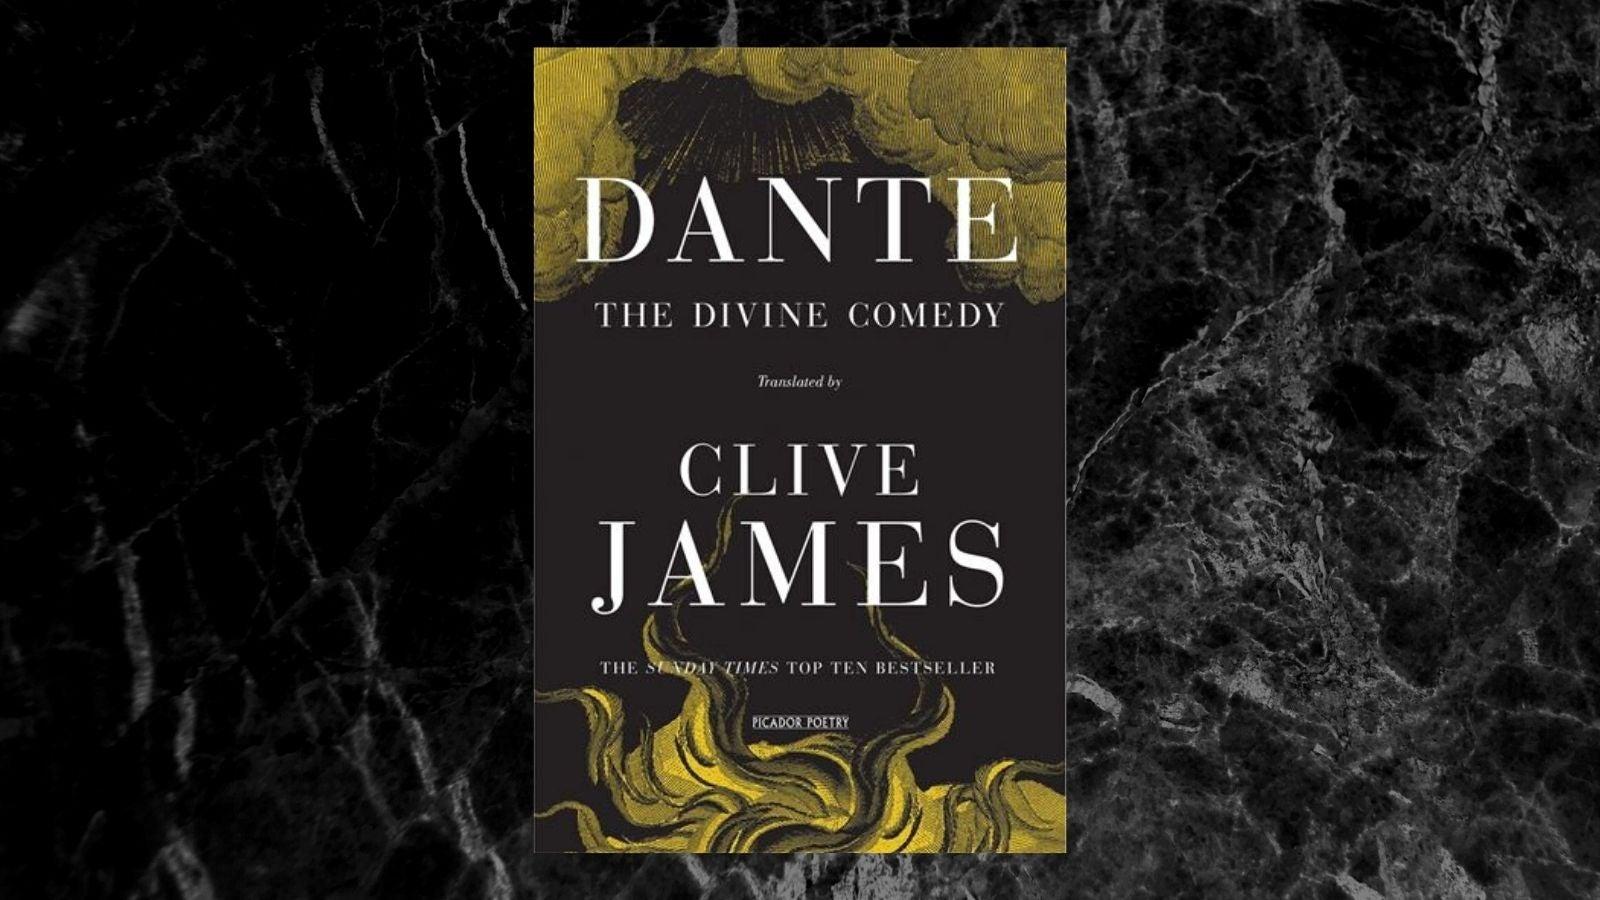 Dante The Divine Comedy Clive James